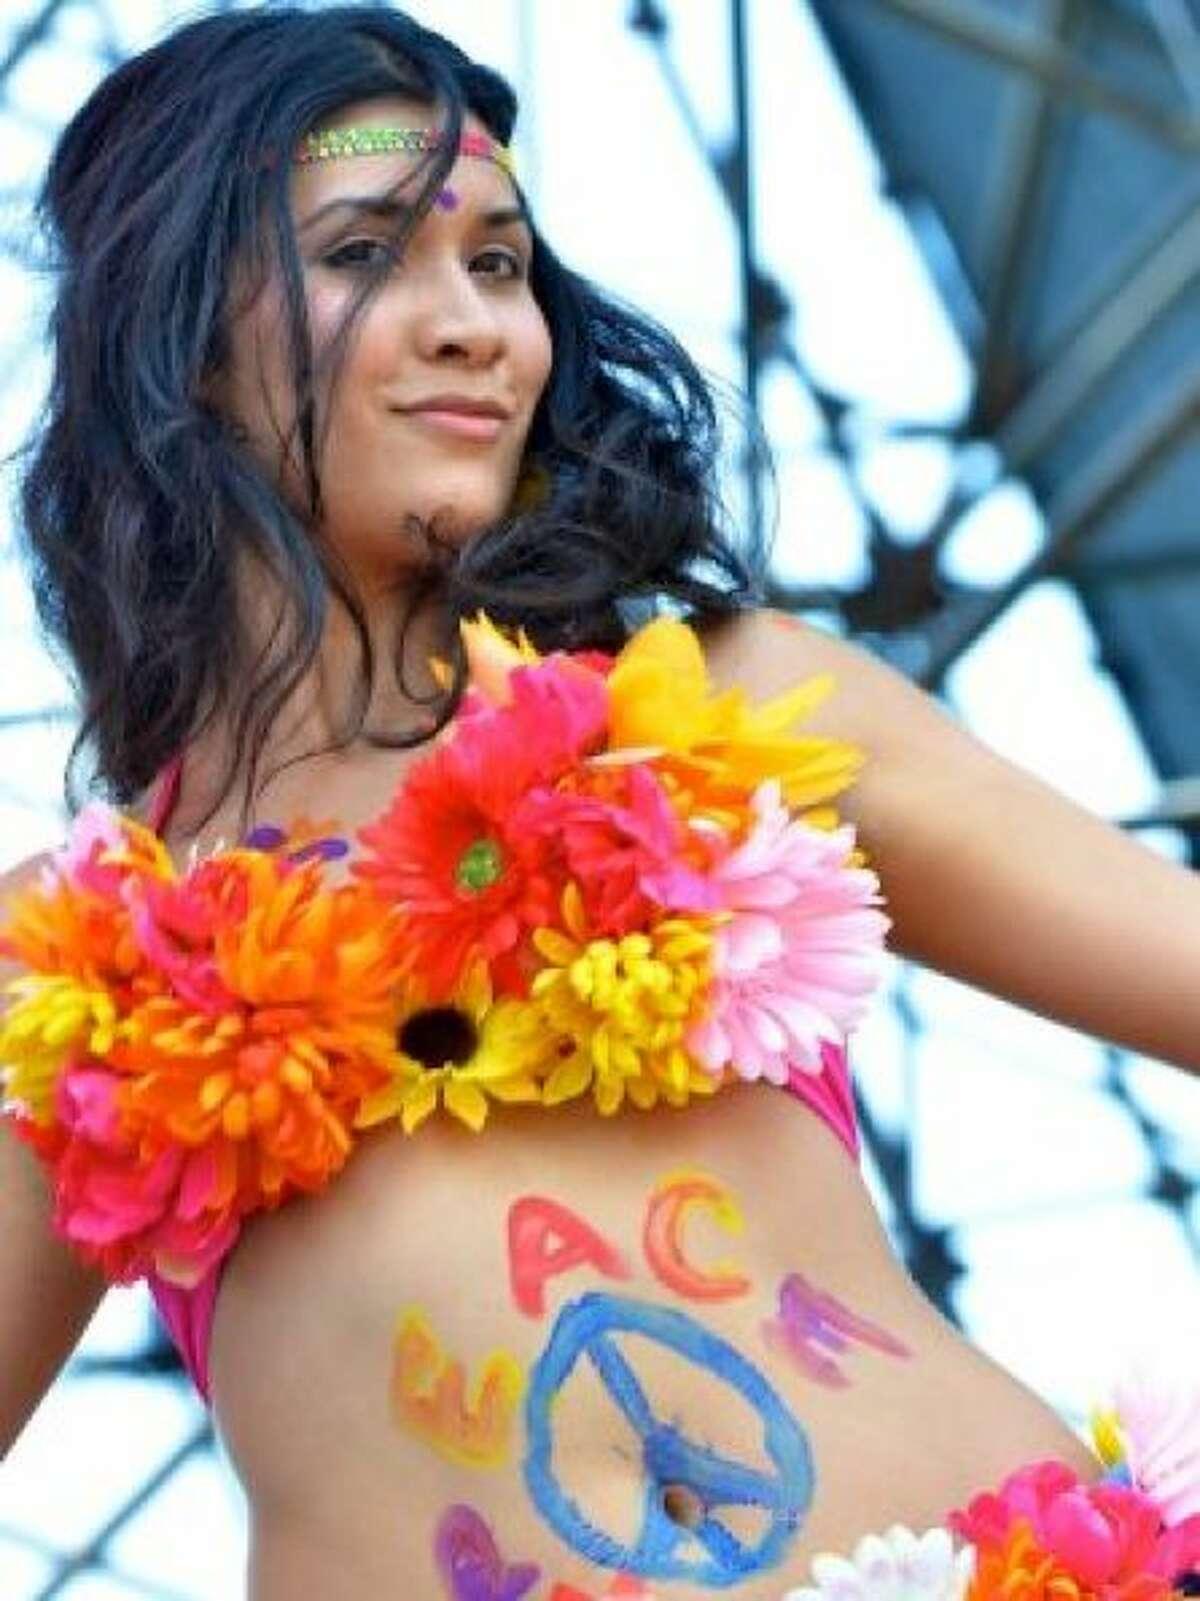 Flower bikini tops are always in season.